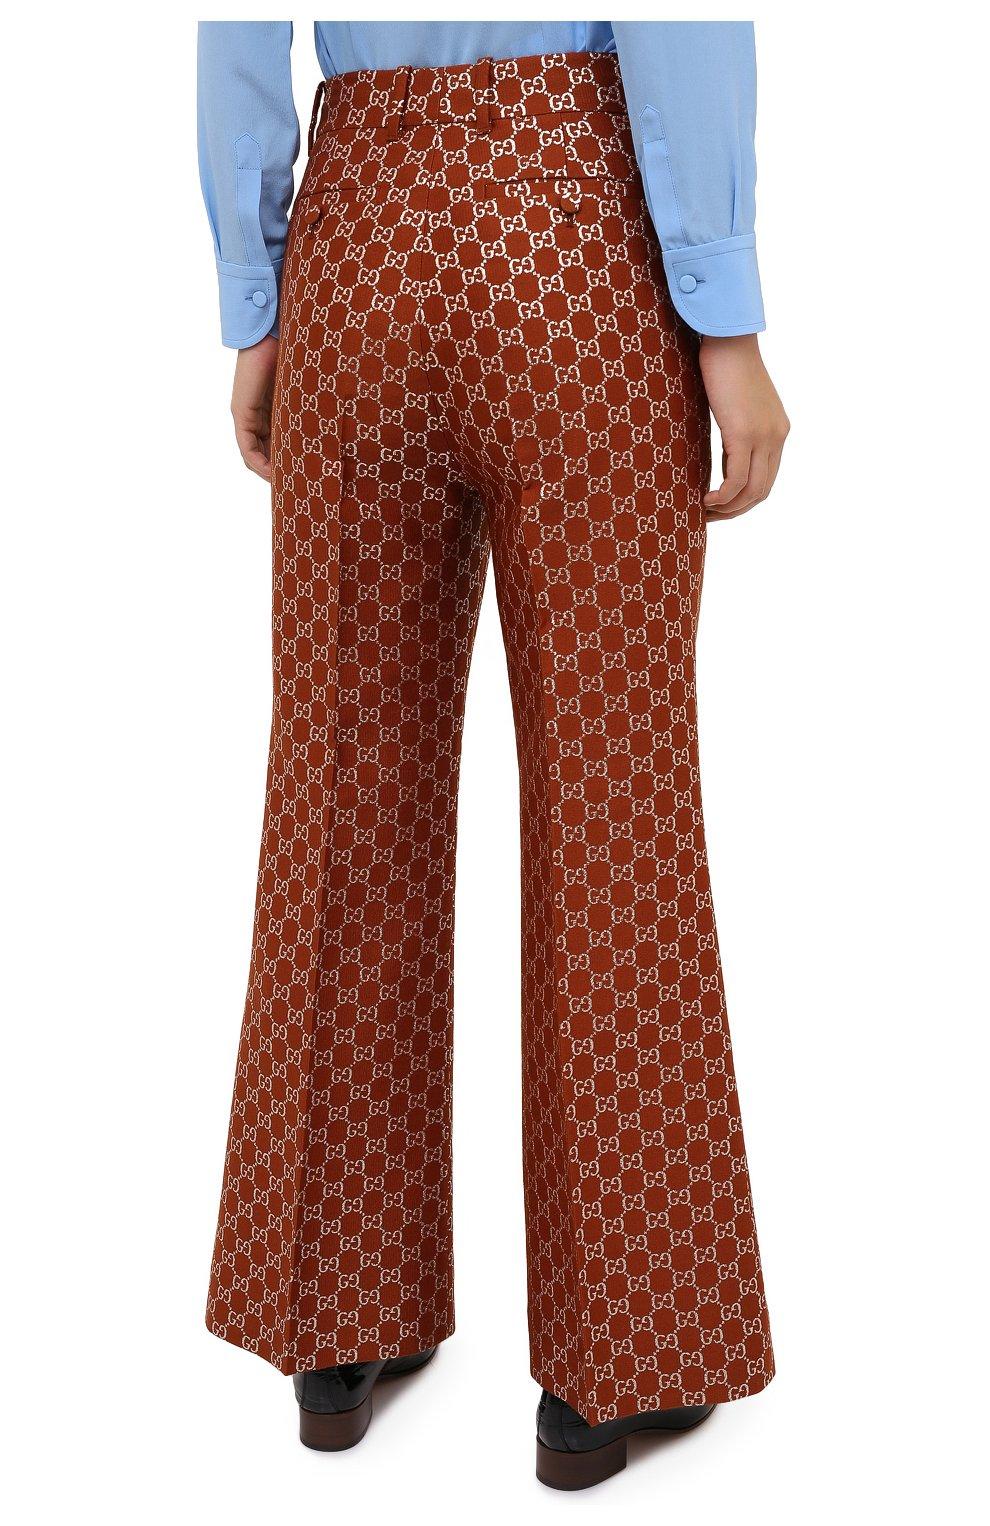 Женские брюки из шерсти и шелка GUCCI коричневого цвета, арт. 627877/ZAD7L | Фото 4